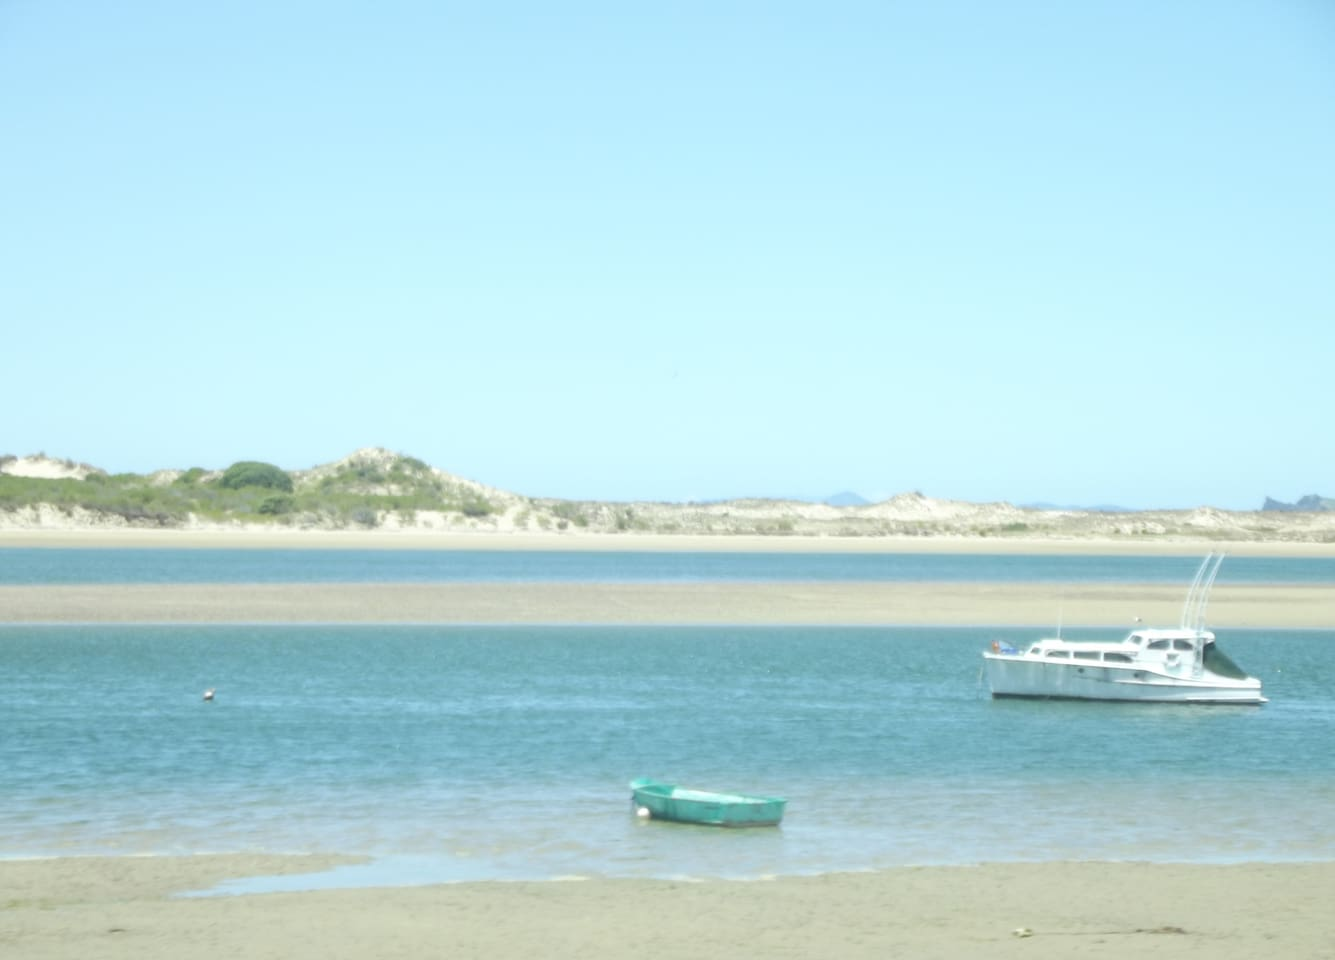 Arriving at Ngunguru Estuary